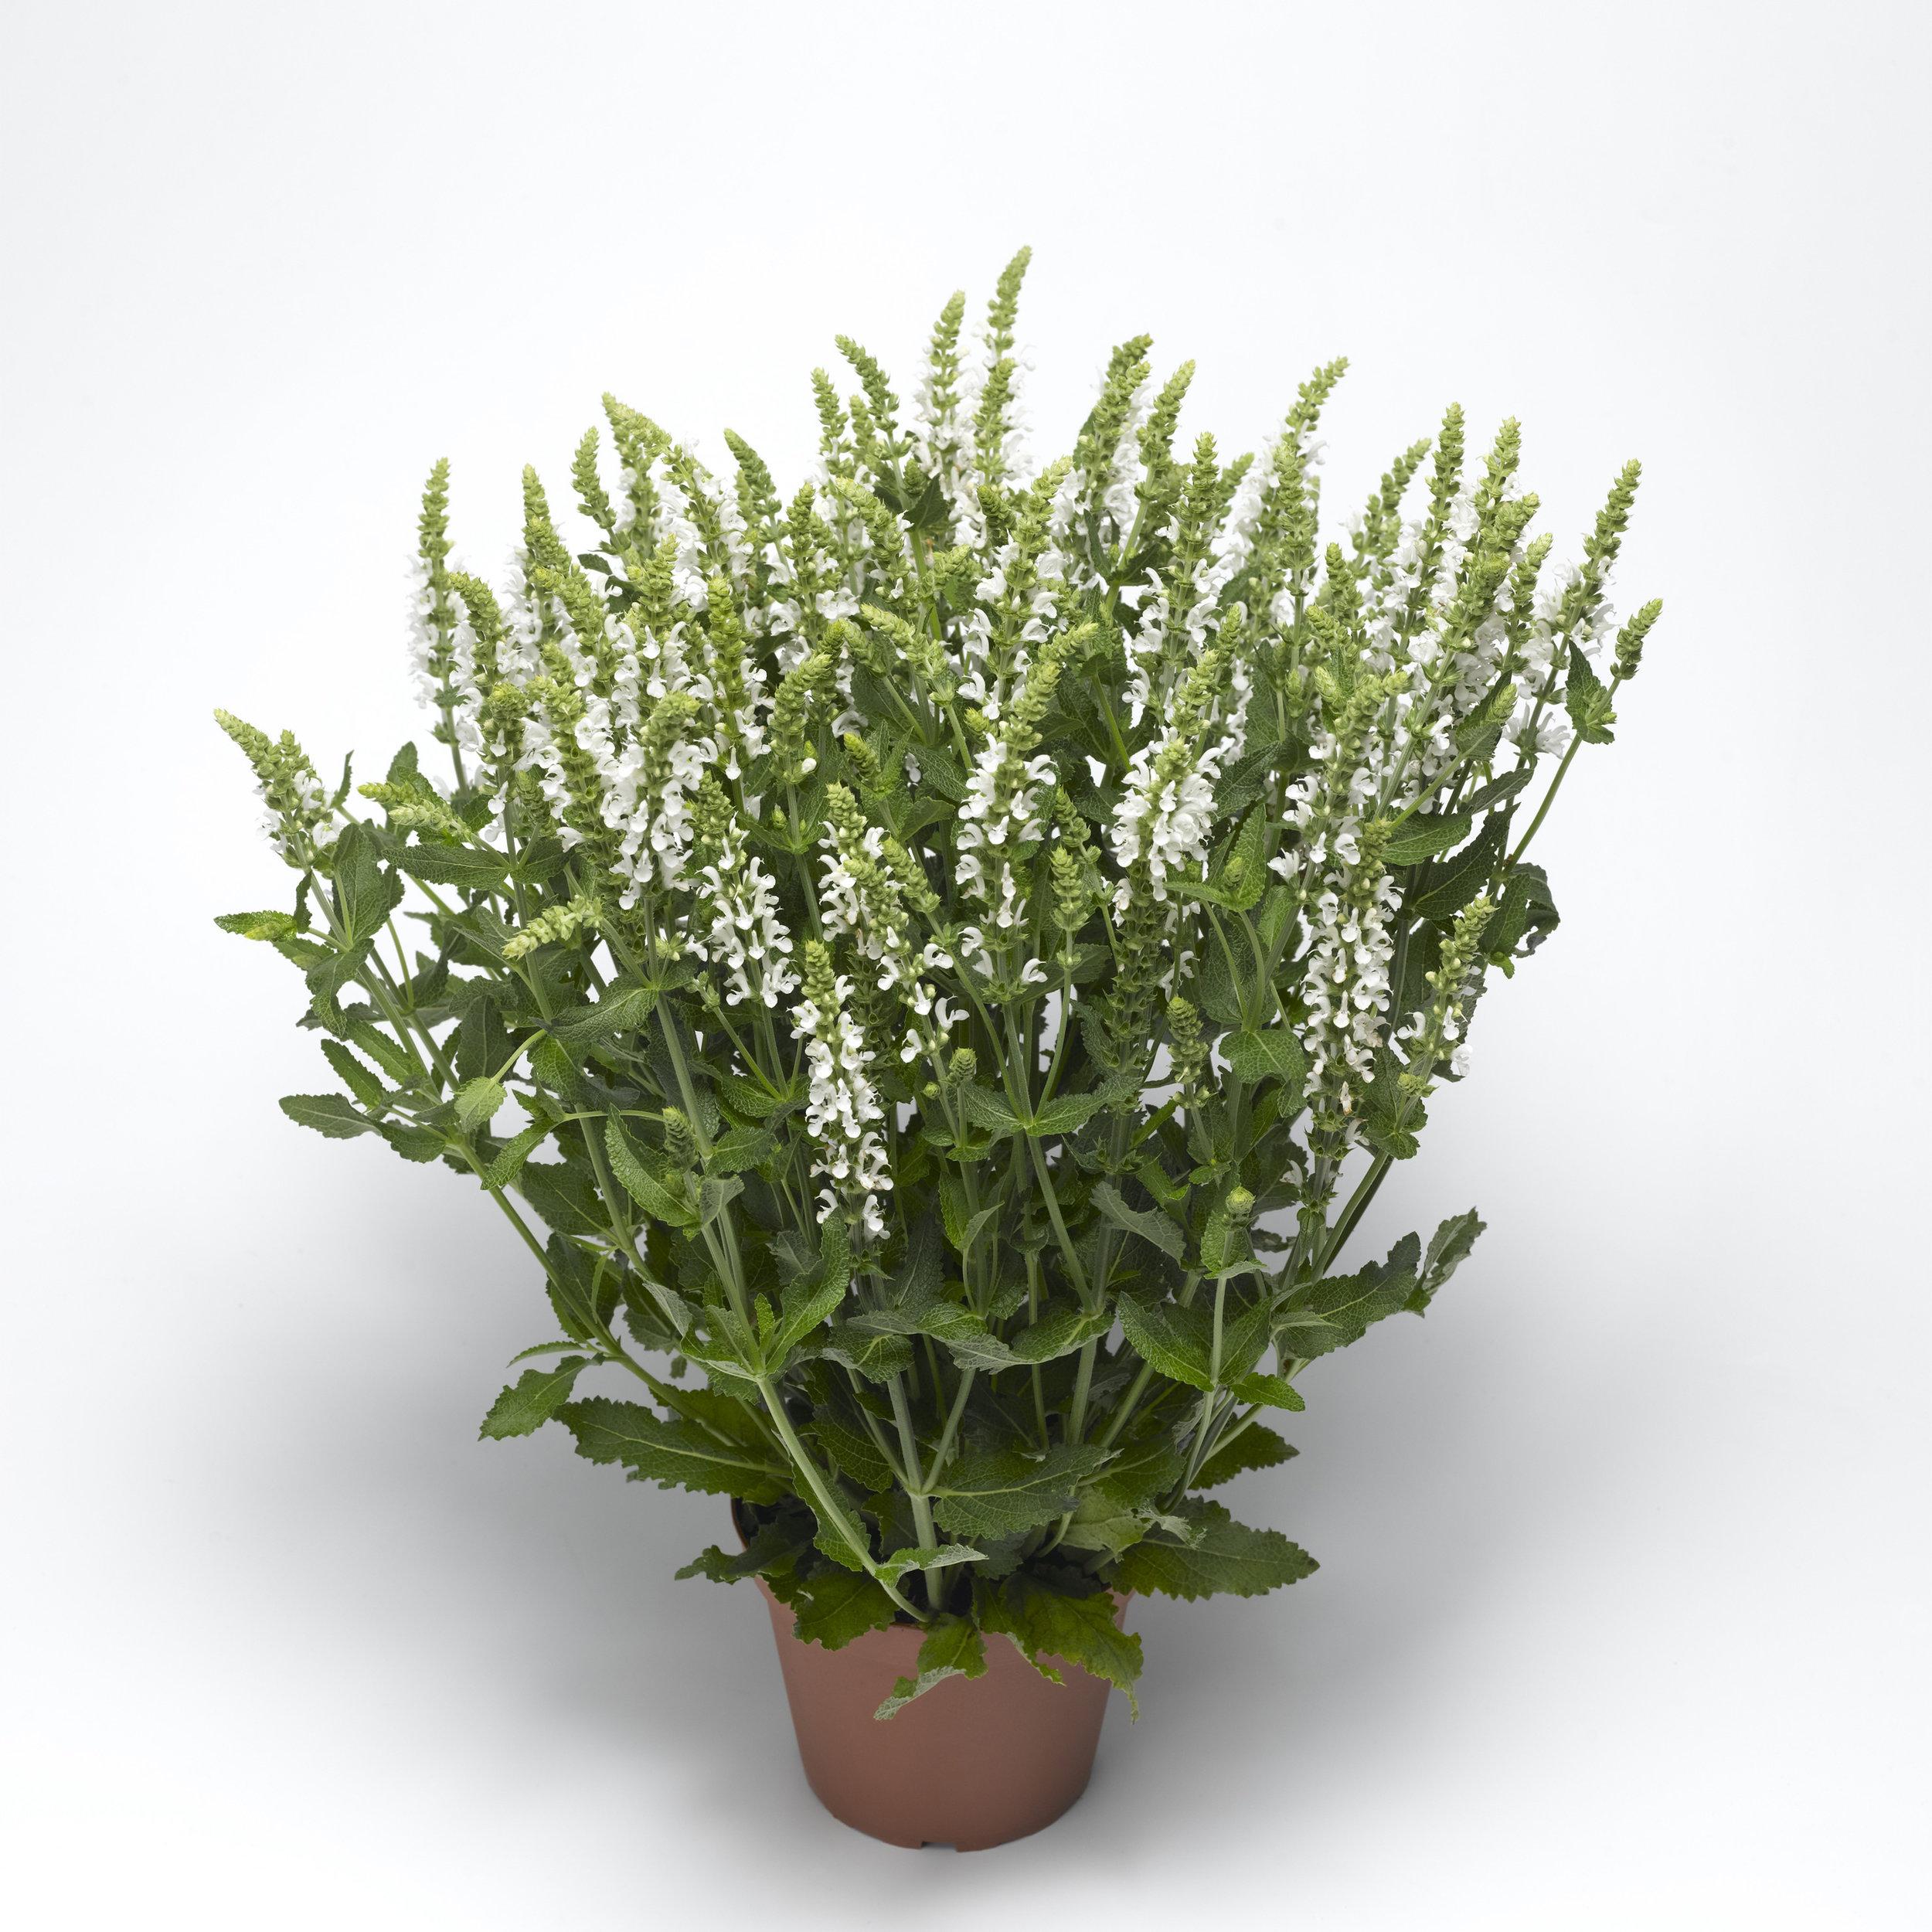 HR_Vegetative_Salvia_Bordeau™_Bordeau™_White_70035625_2.jpg